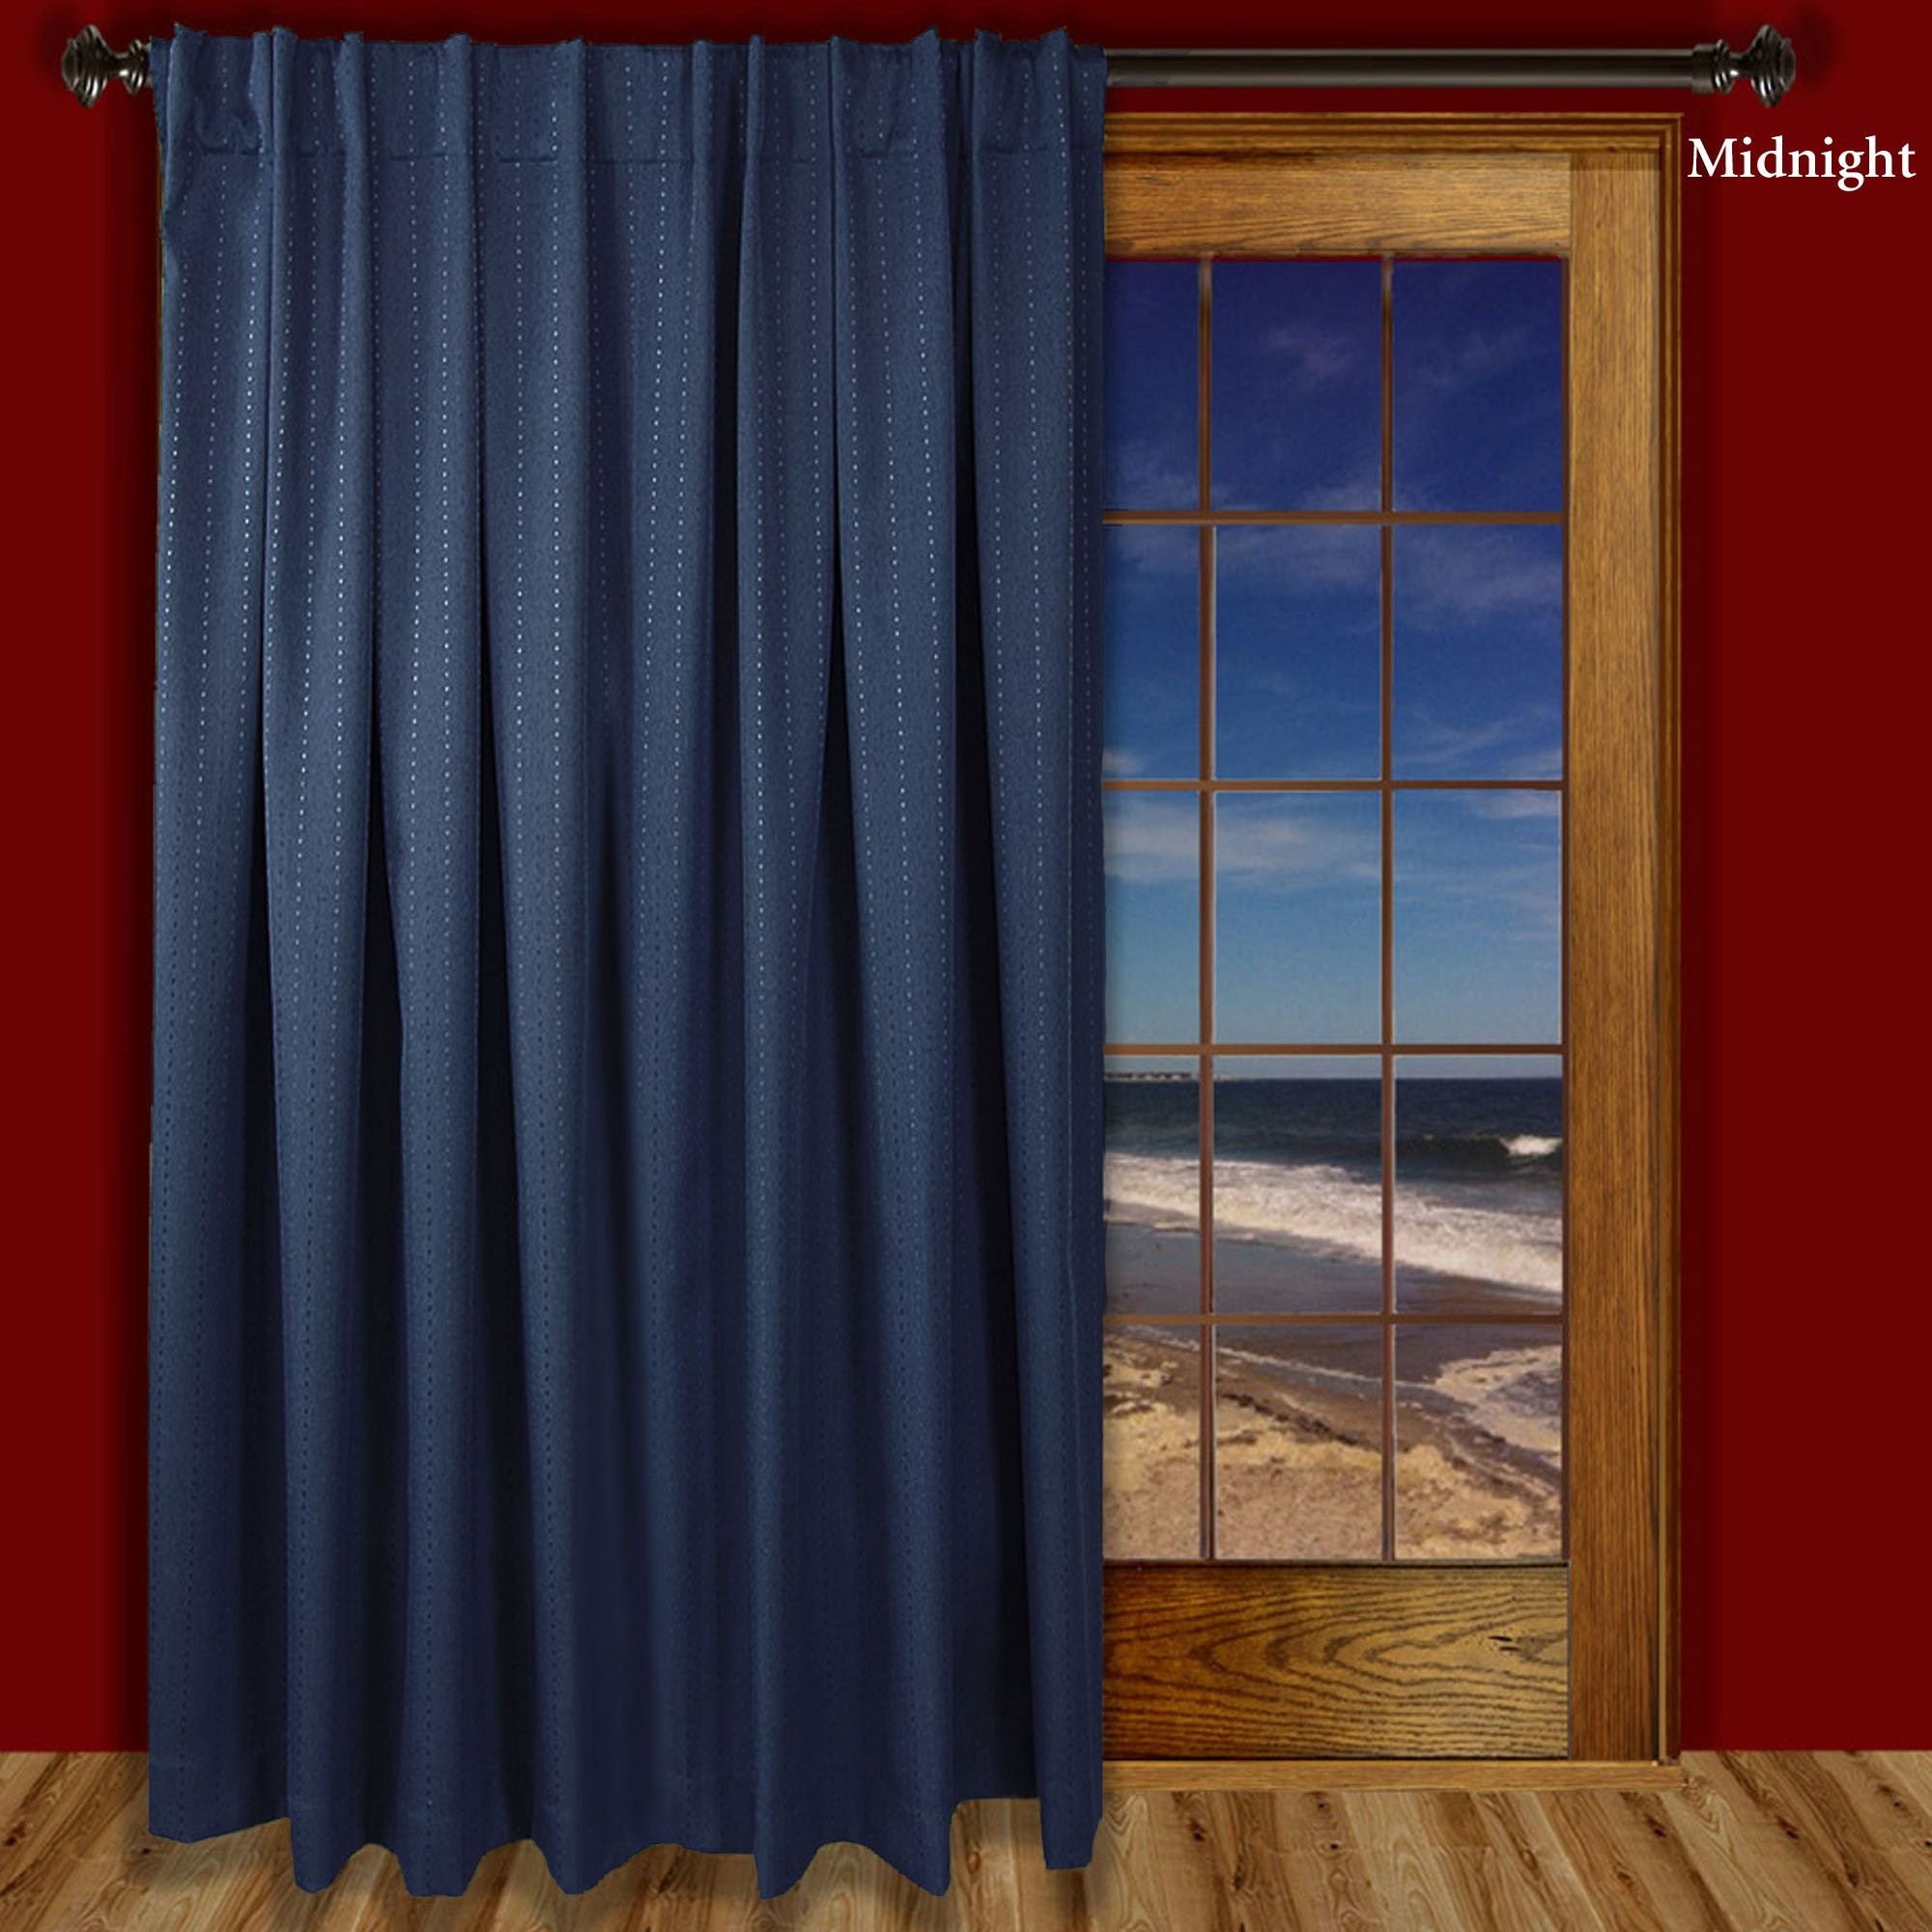 Grand Pointe Room Darkening Thermal Patio Panel